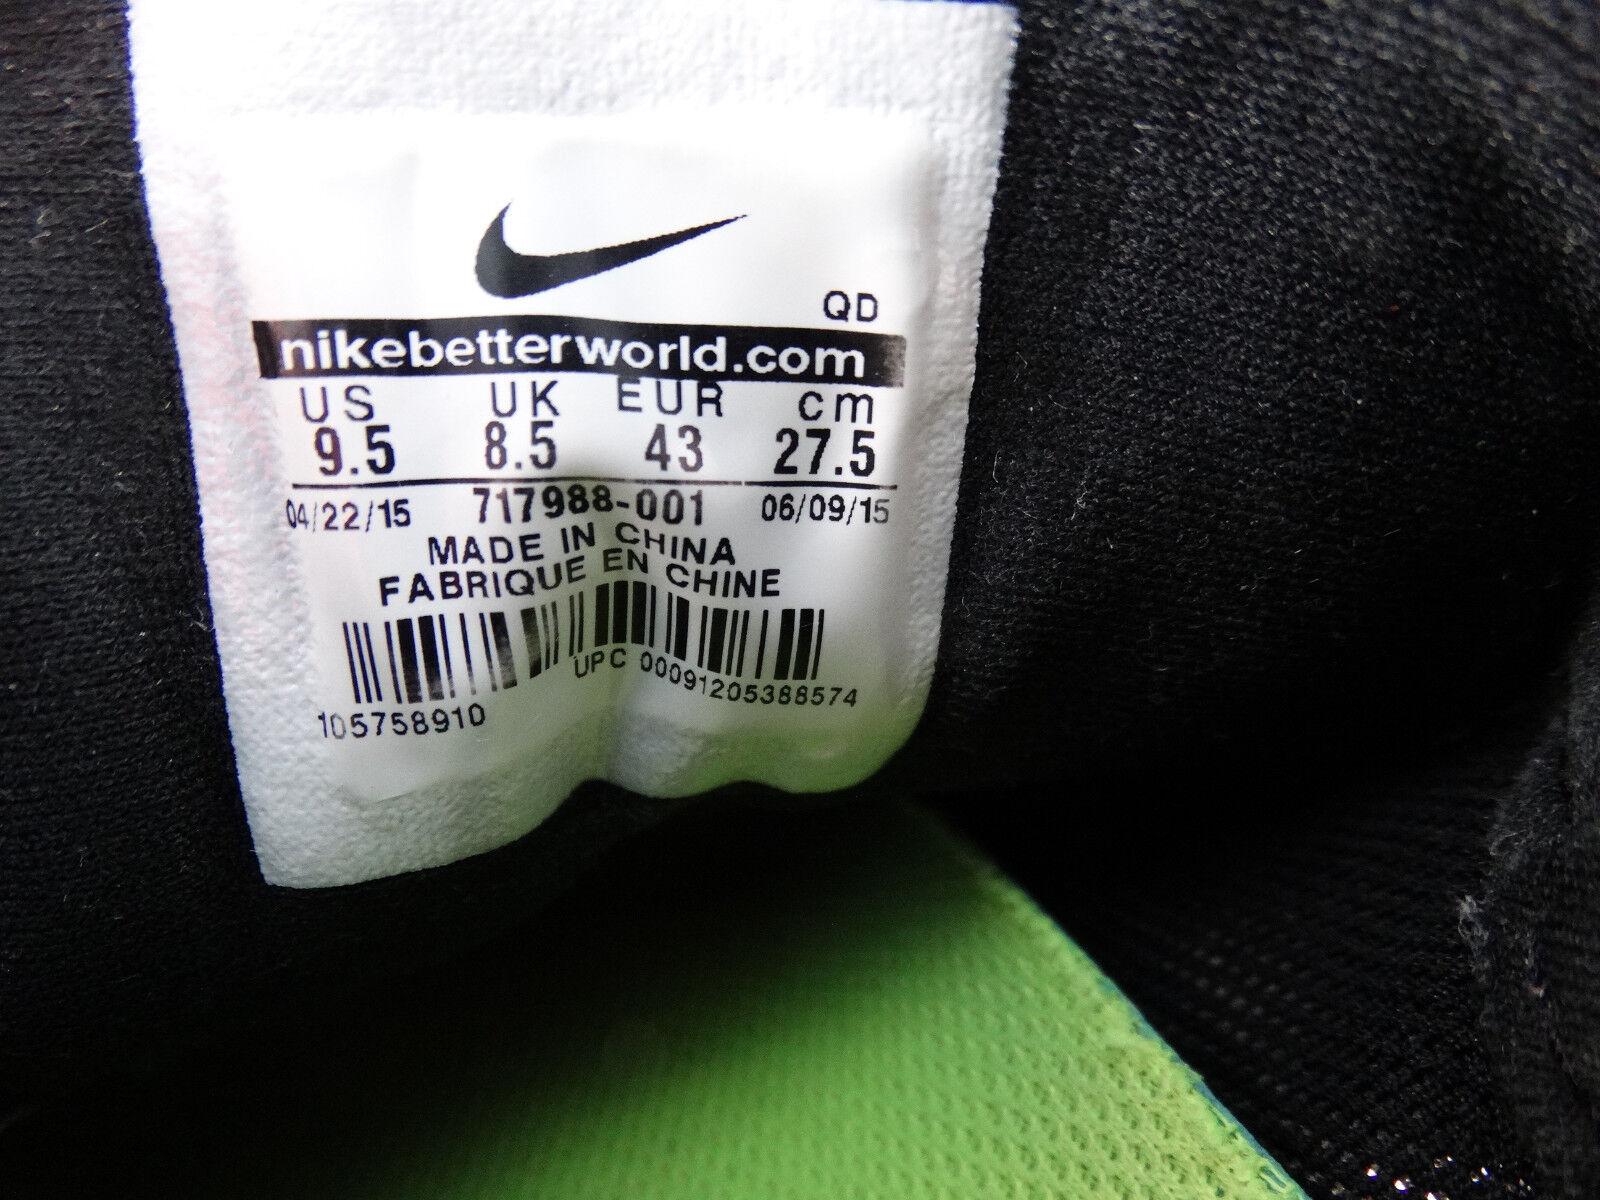 Nike Free 4.0 US V5 Laufschuhe 717988-001 schwarz-grau-weiß EU 43 US 4.0 9,5 93efd6